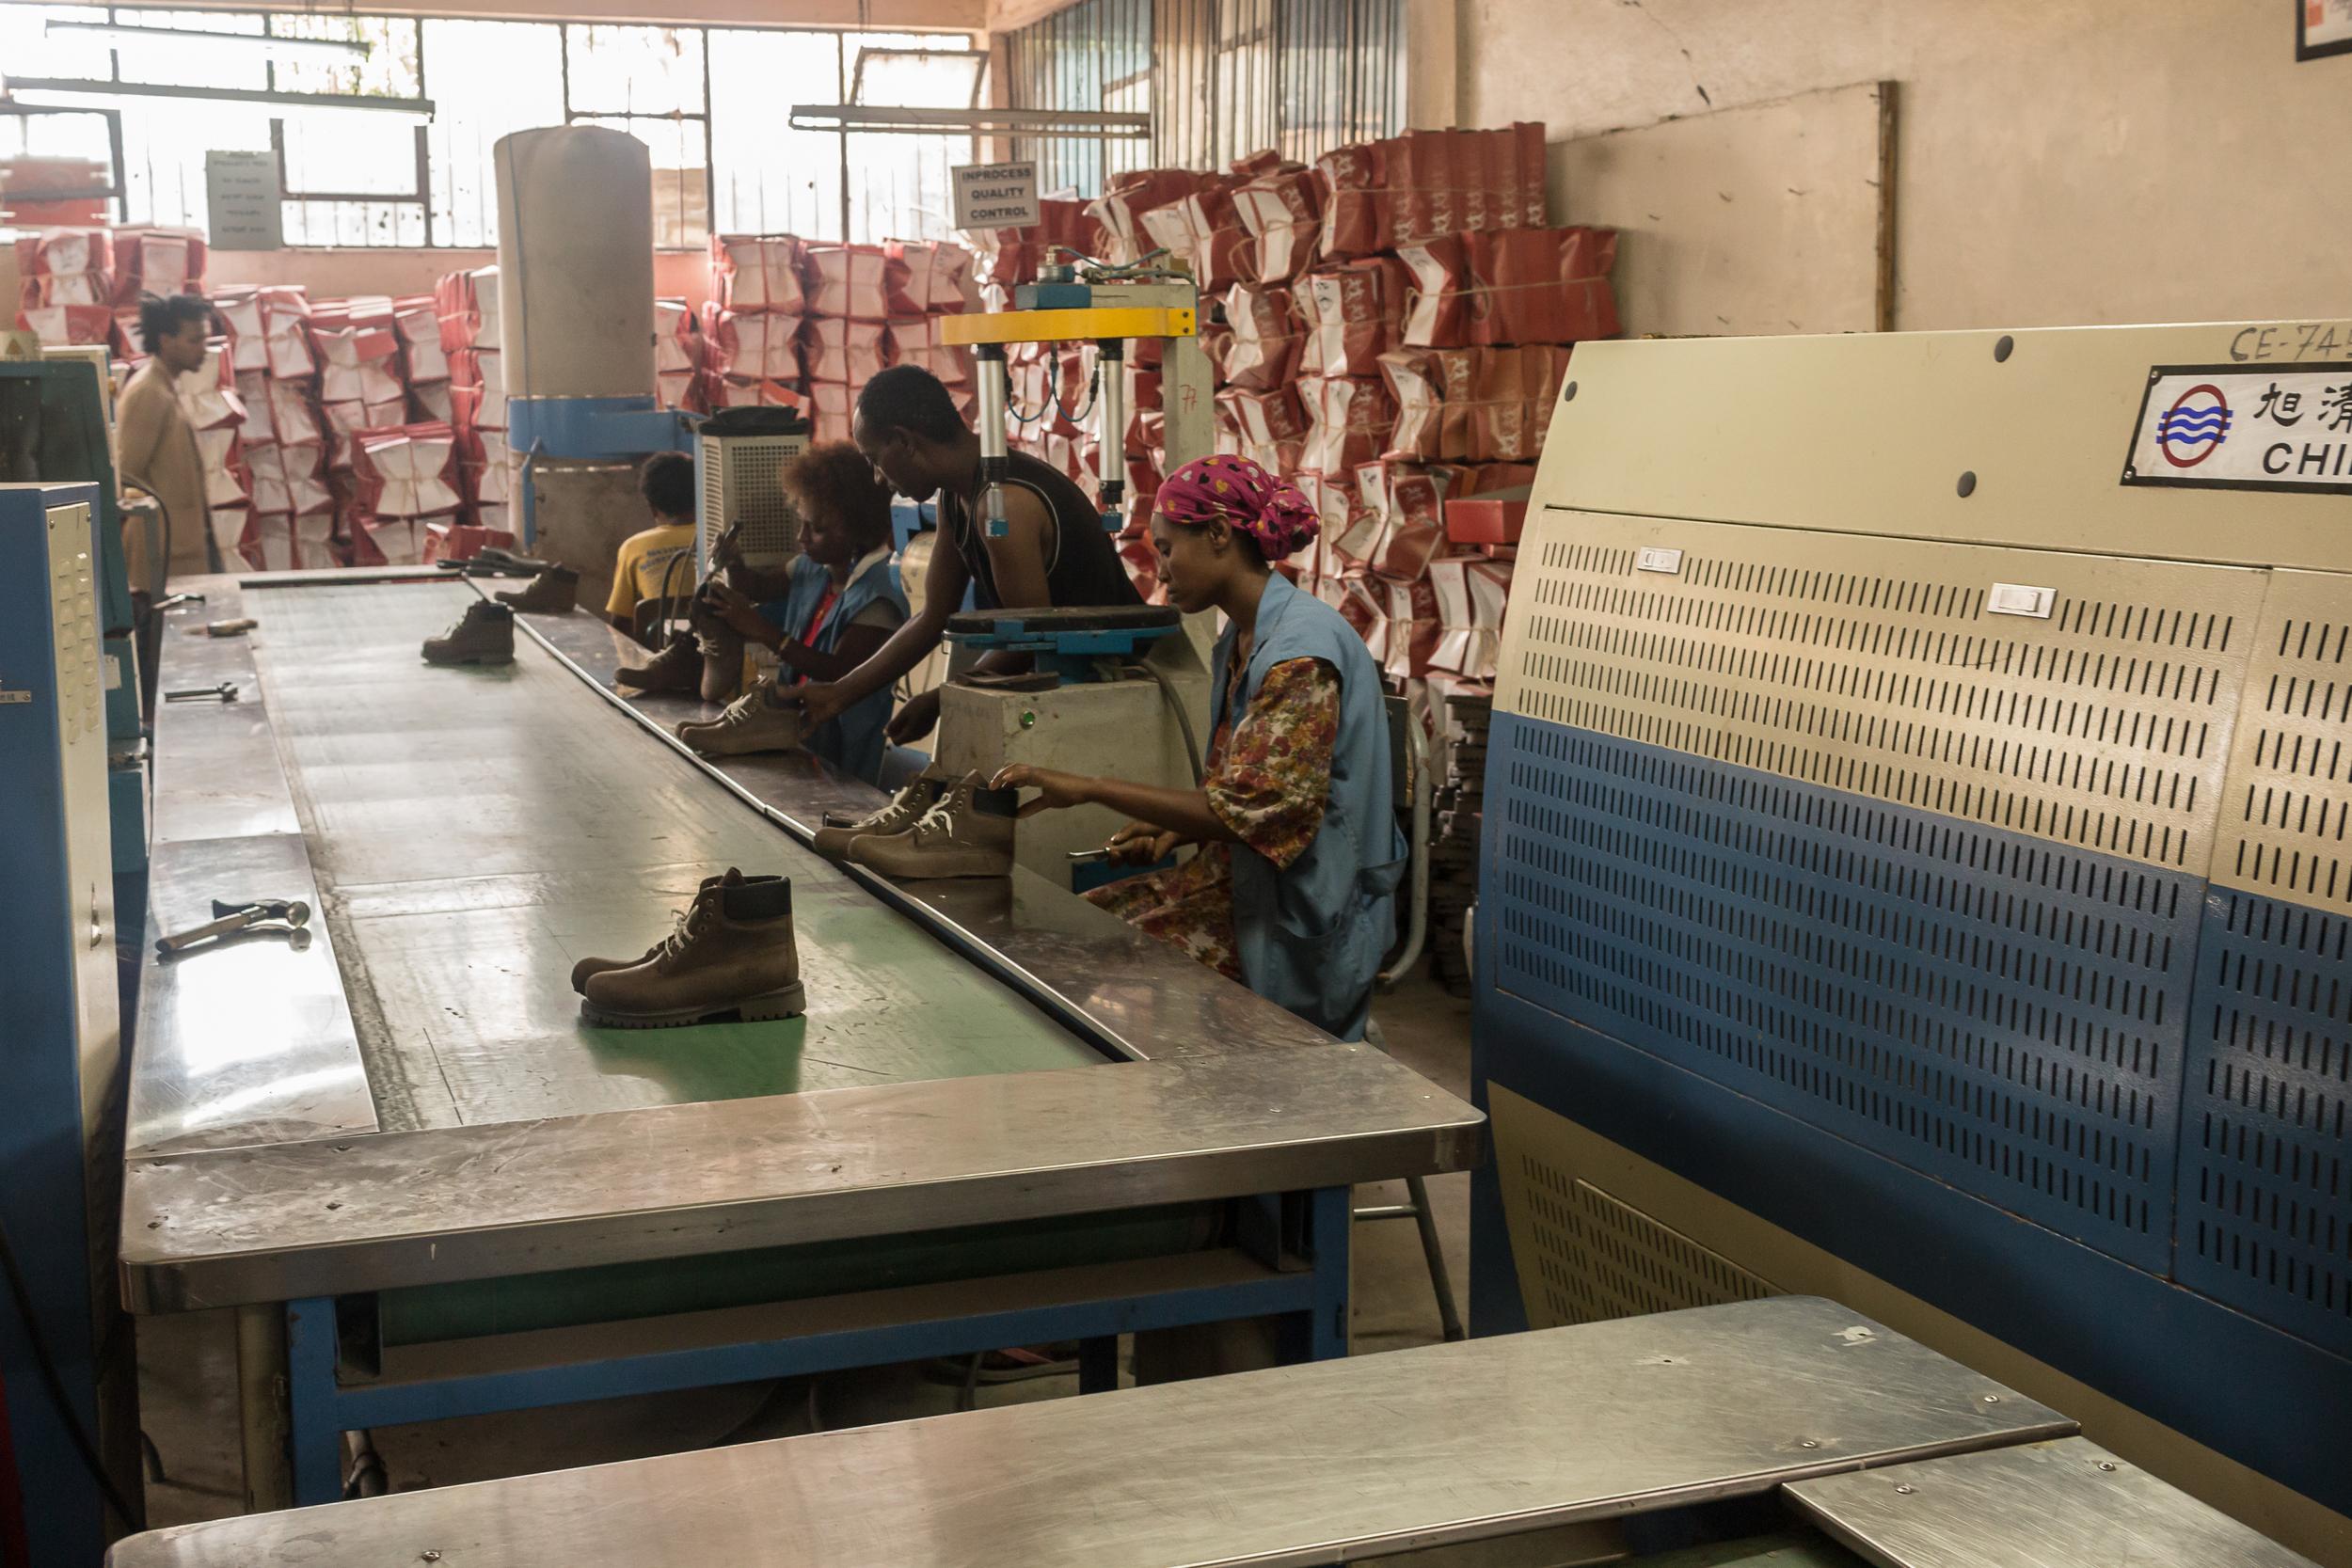 ethiopia_factory-9605.JPG